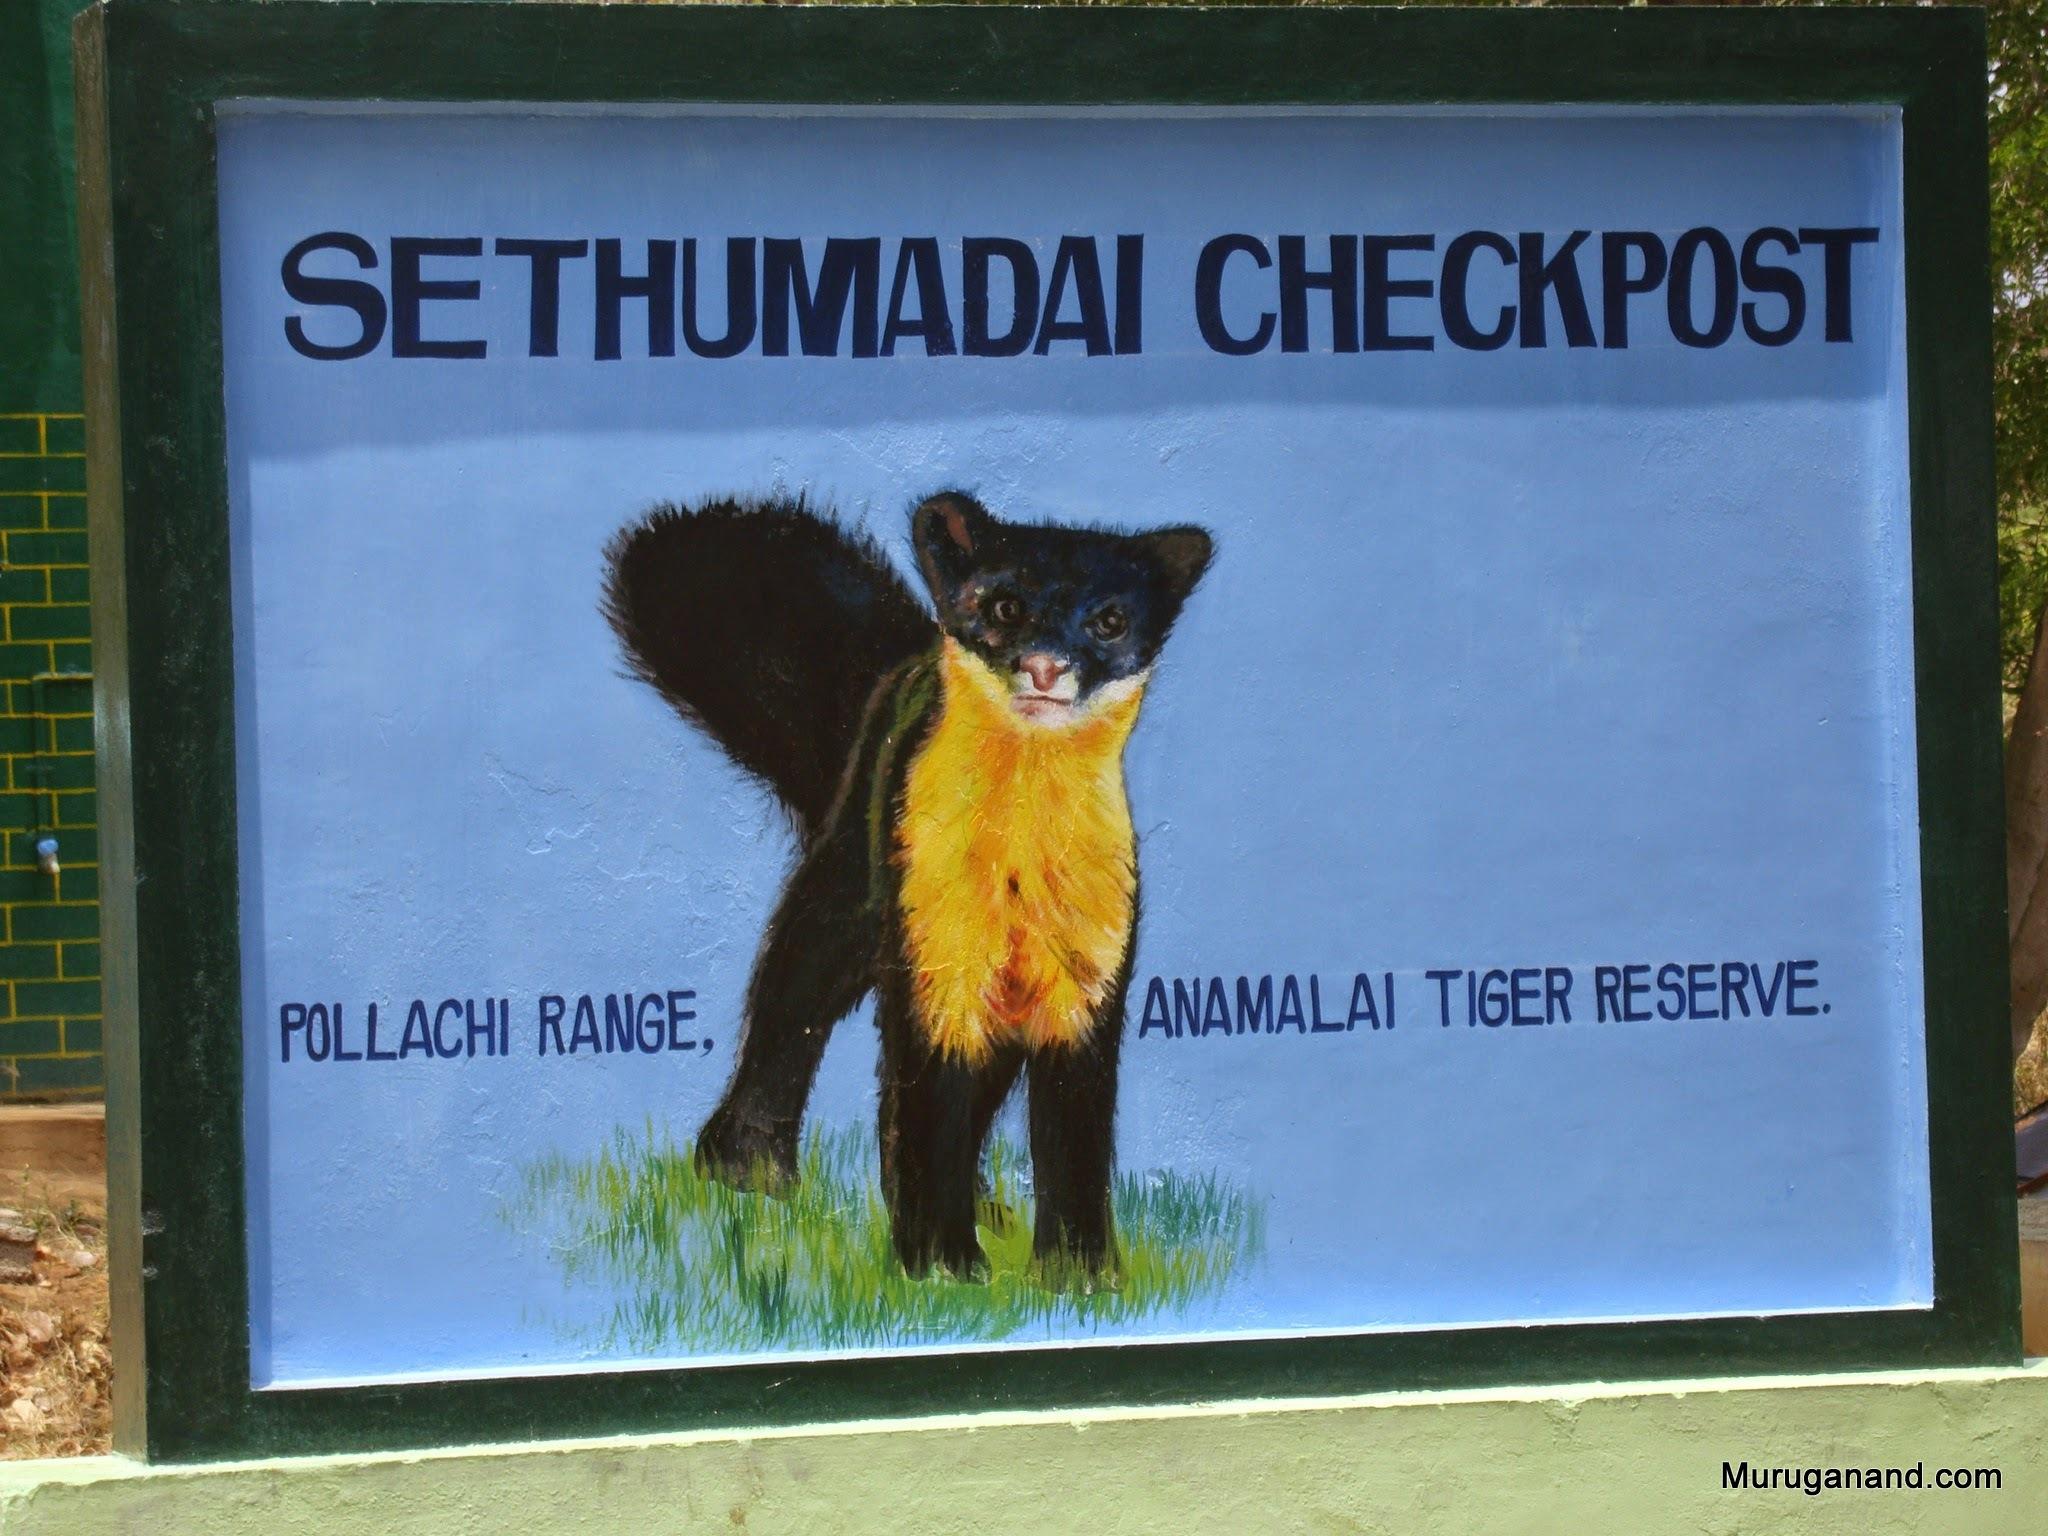 Nilgiri Marten, a weasel like animal